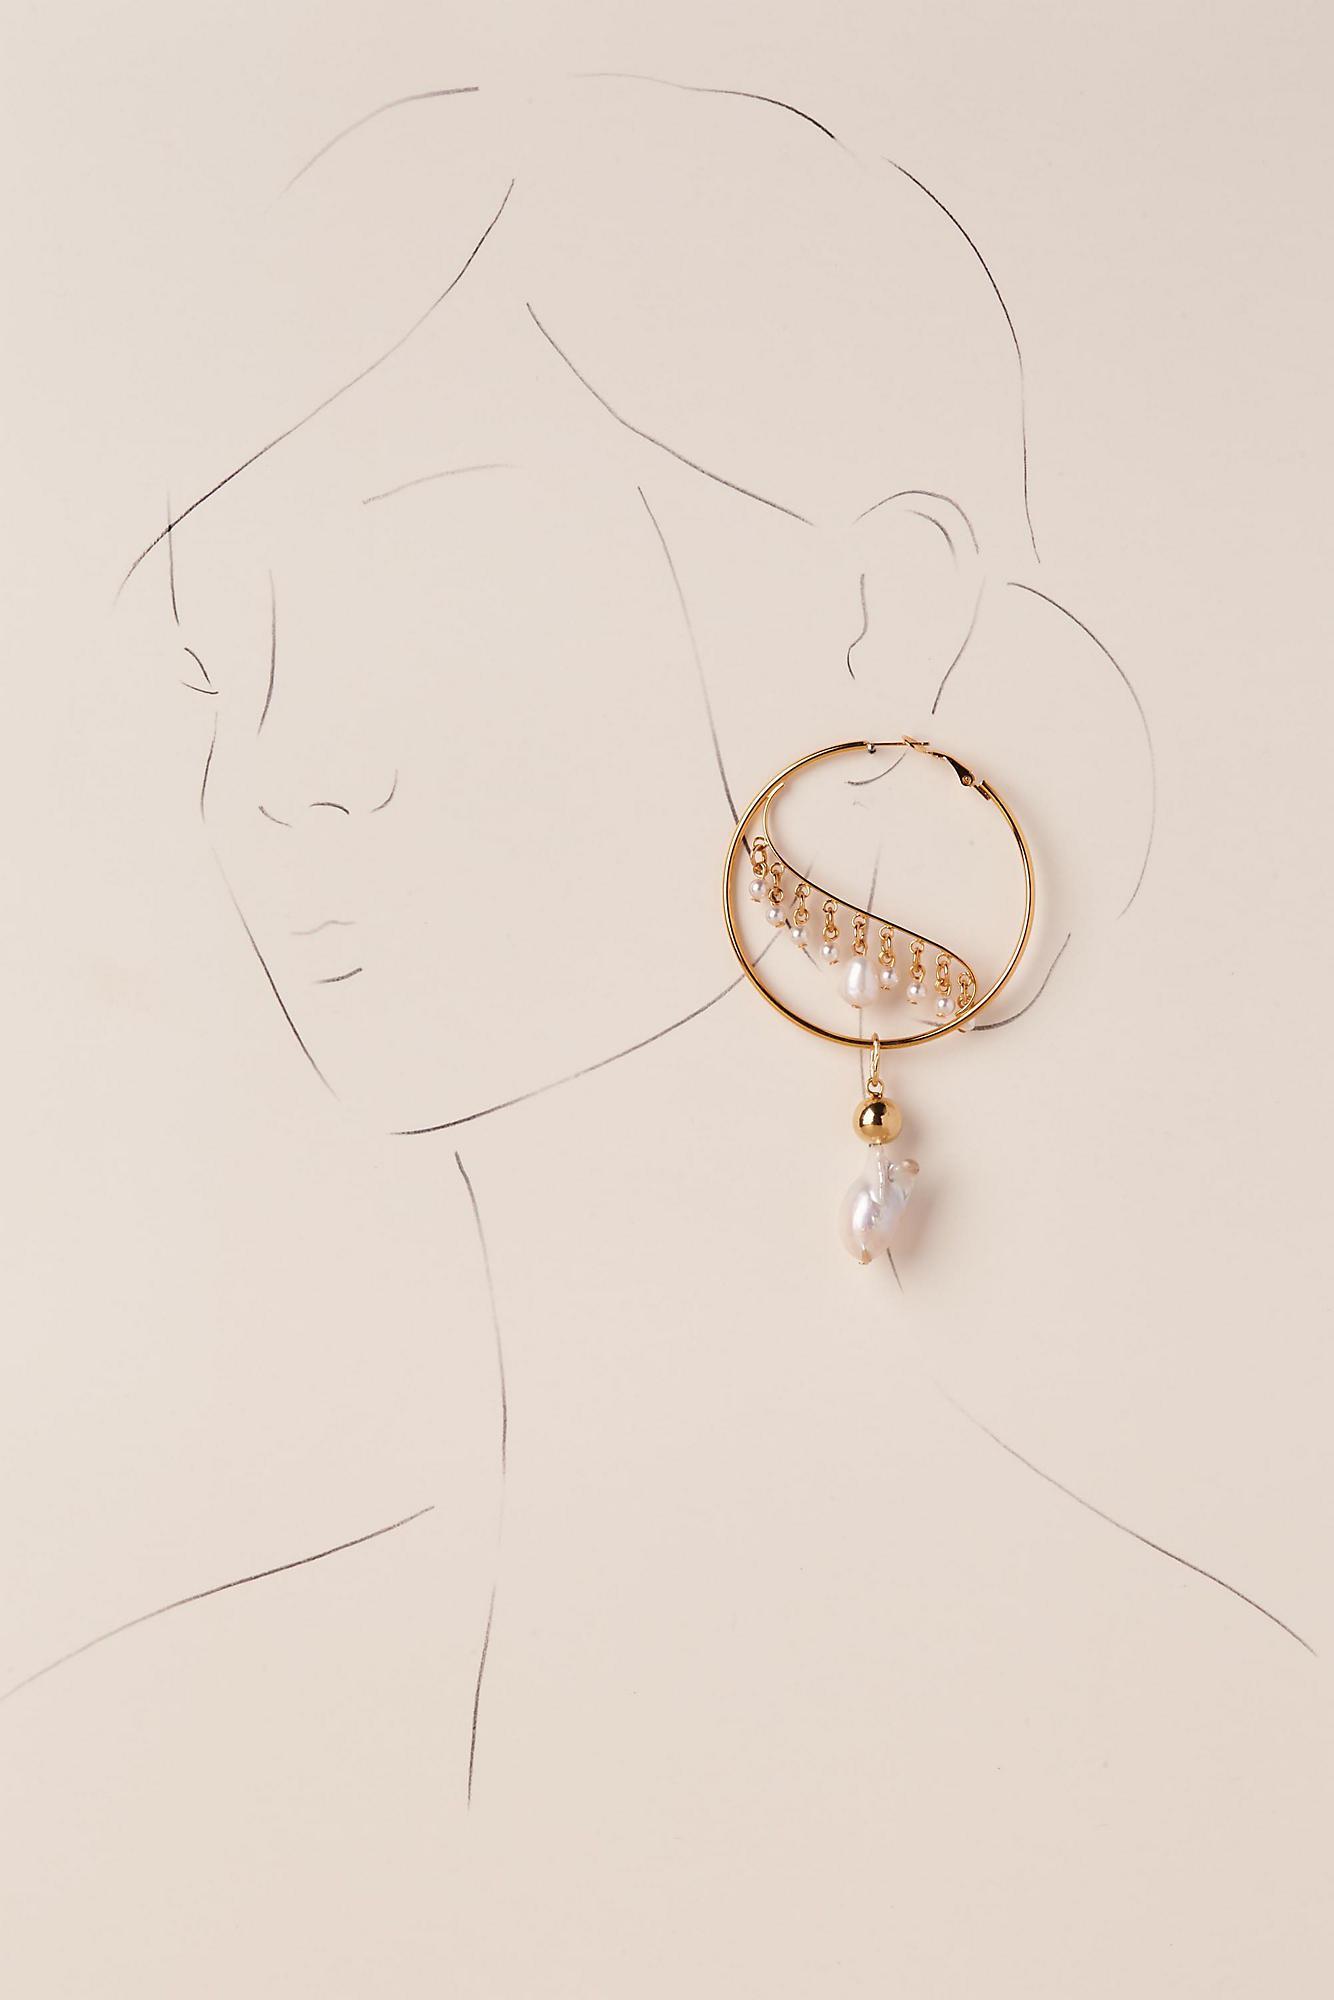 Anthropologie Ziva Hoop Earrings suqox3H